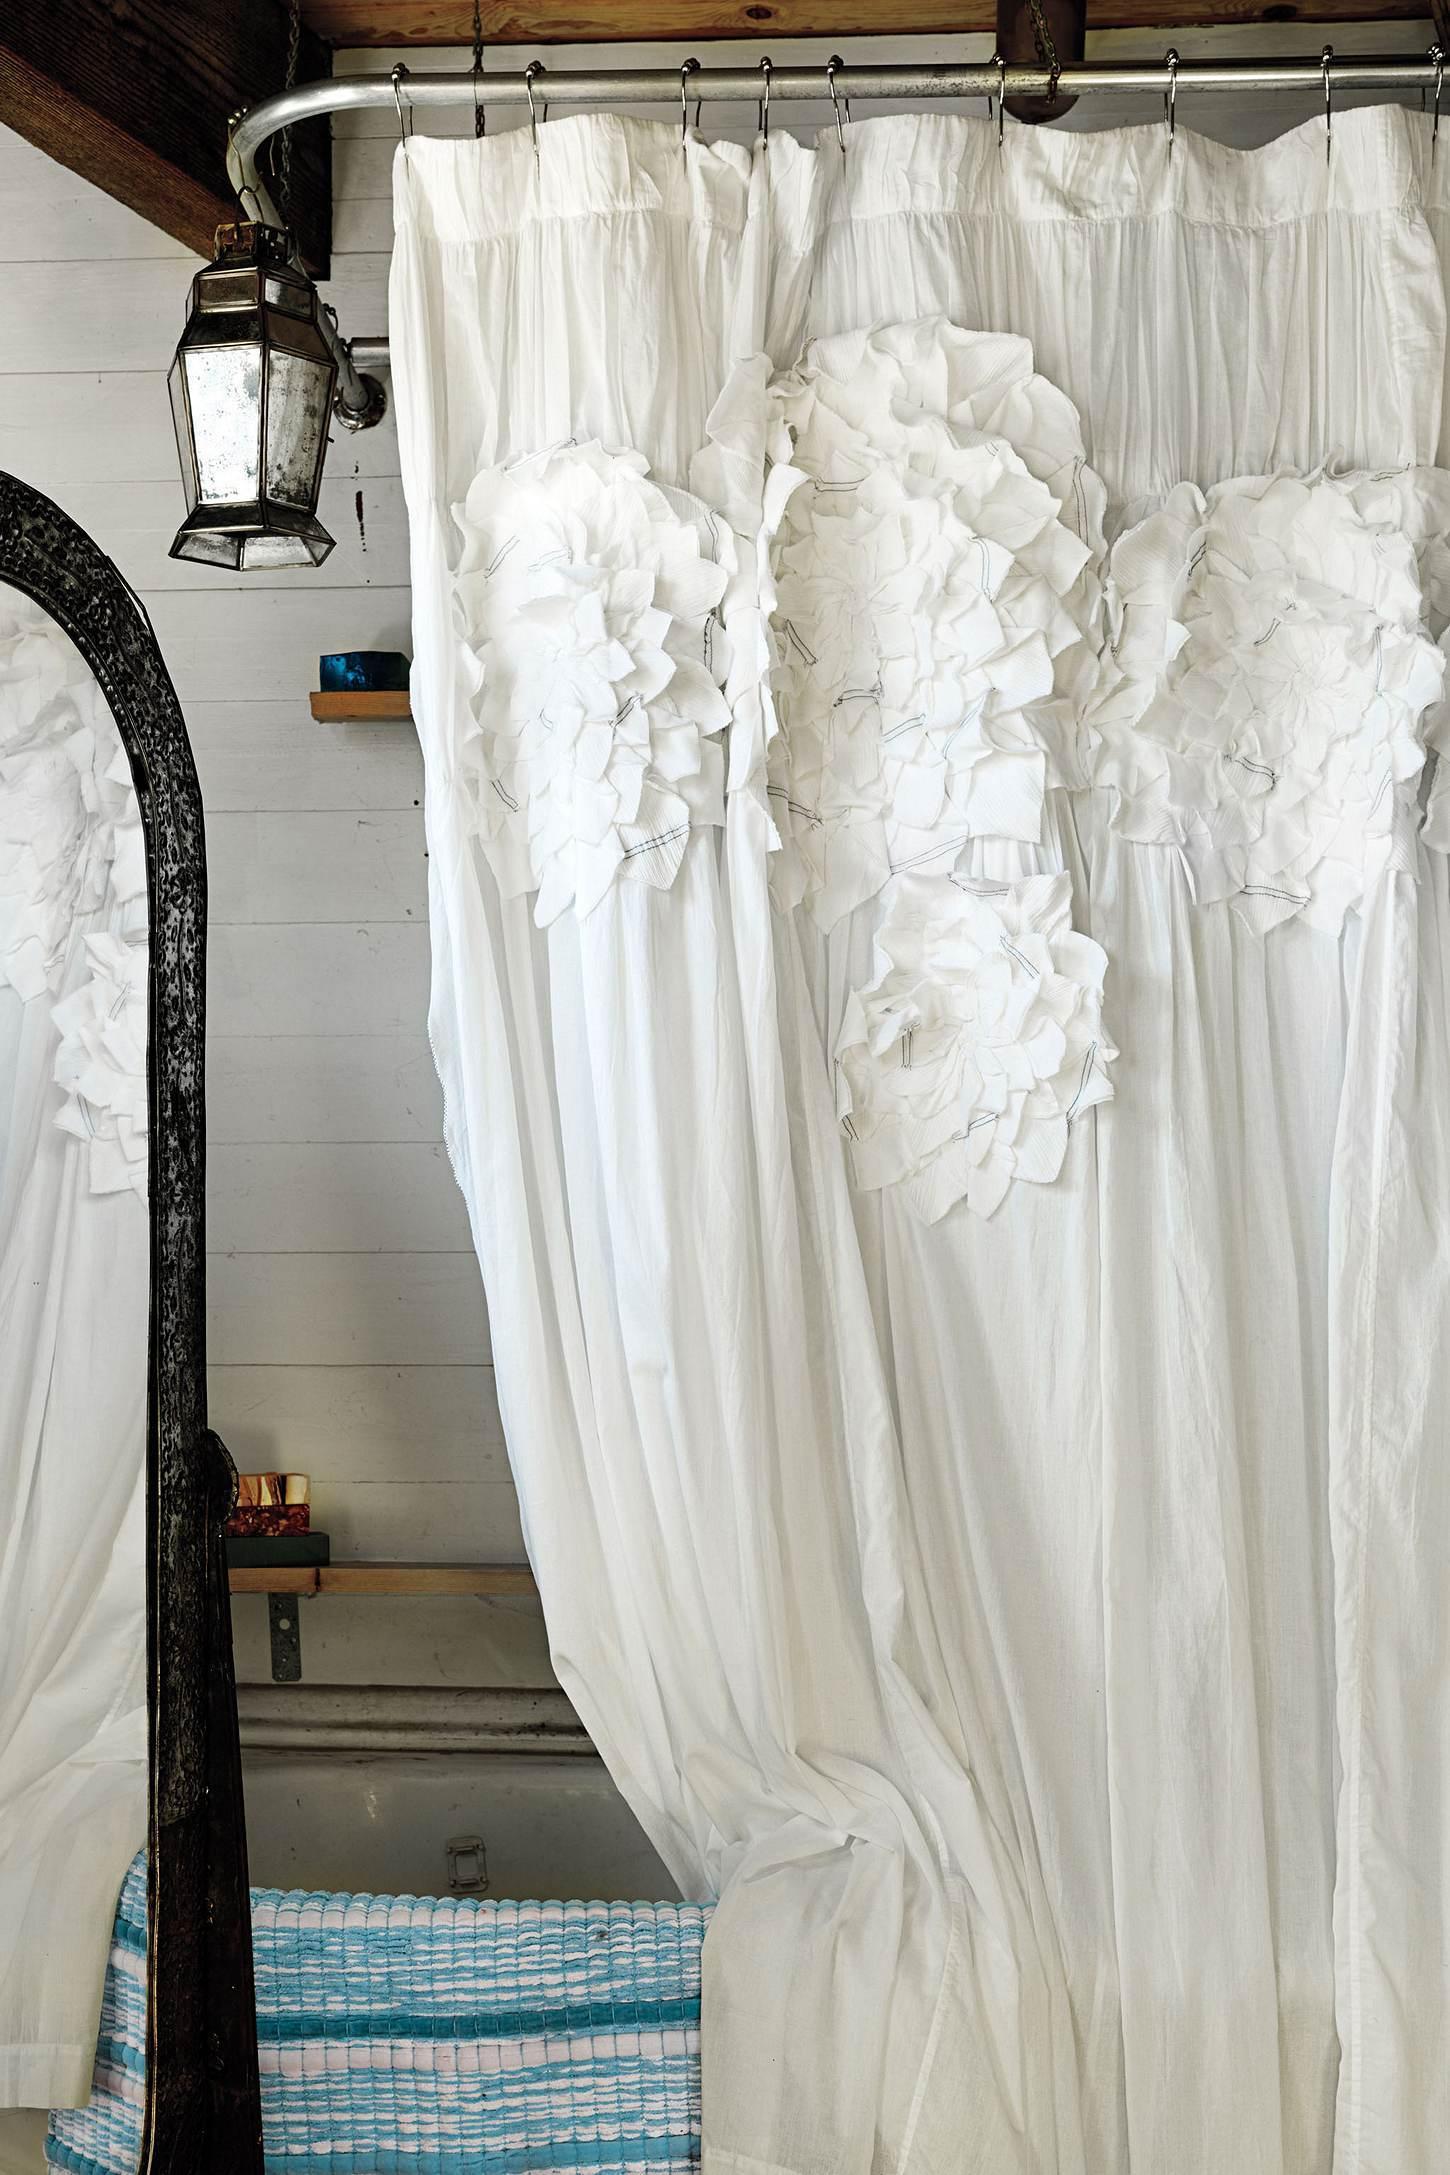 Плюсы и минусы тканевых штор для ванной комнаты